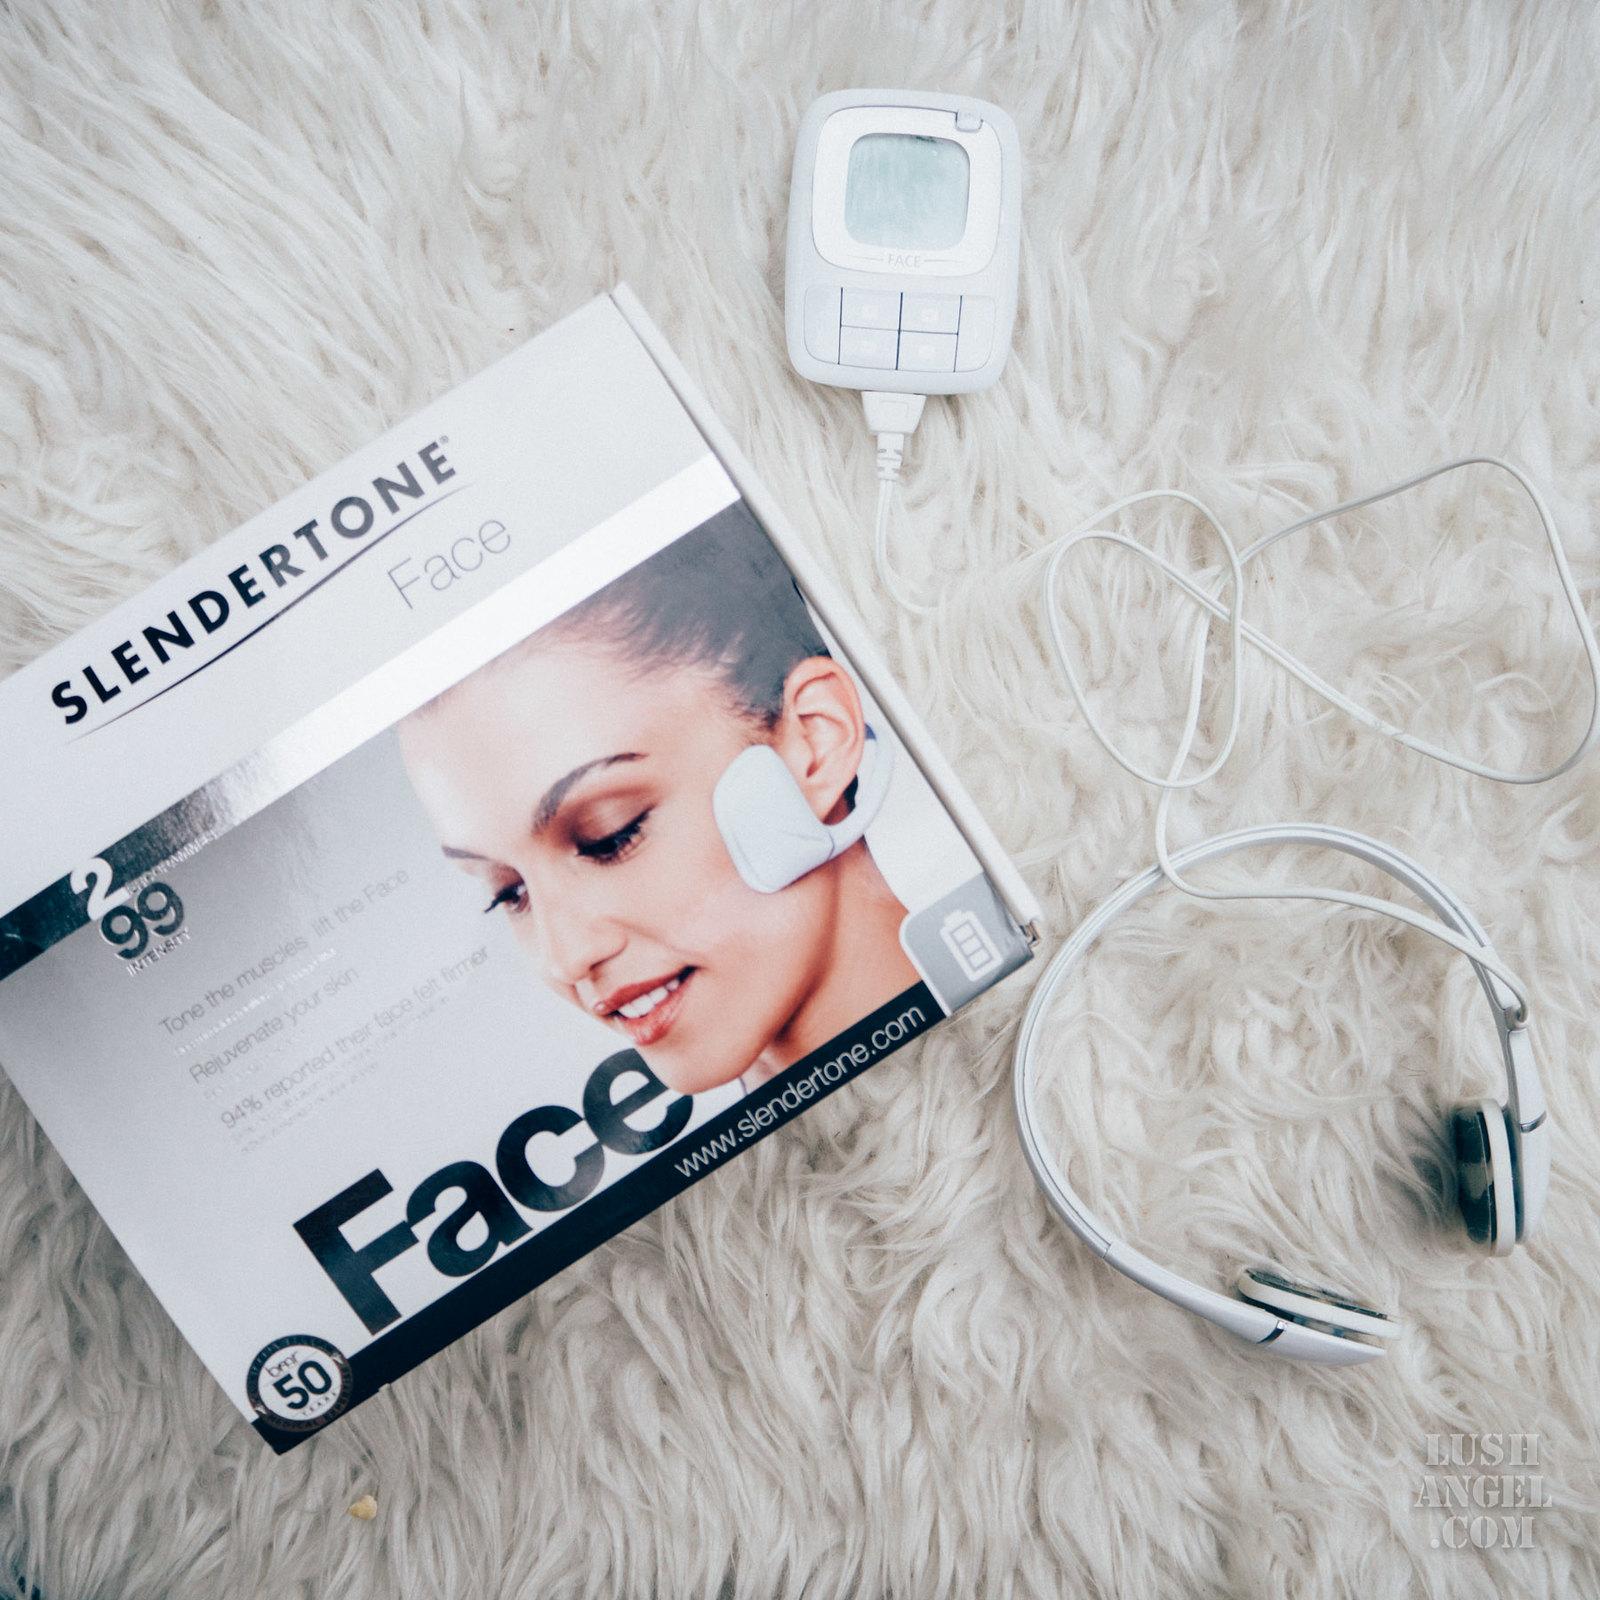 slendertone-face-review